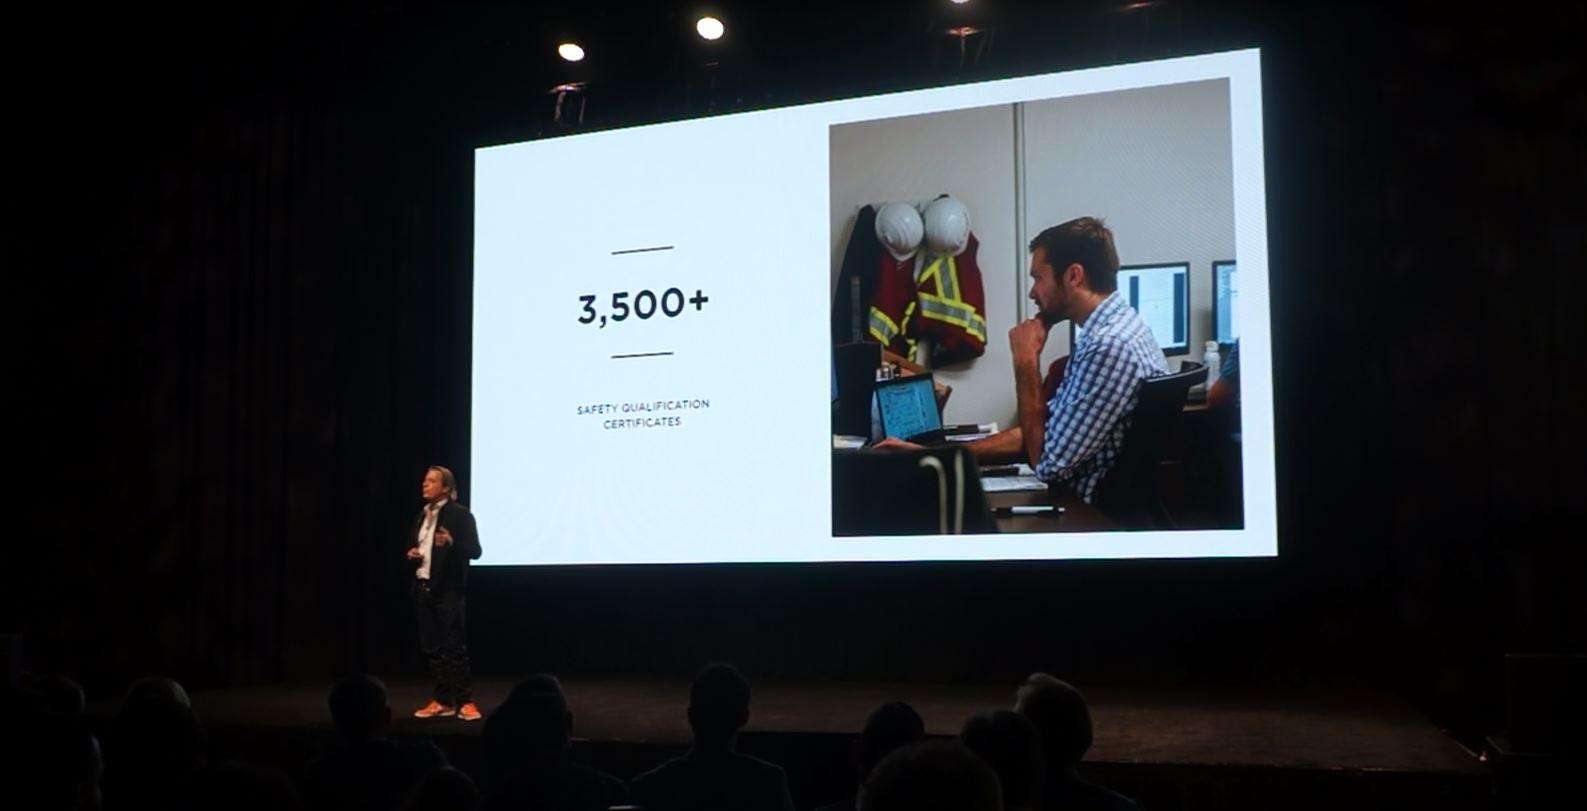 Procore CEO Tooey Courtemanche Speaking About Procore's Safety Platform at Groundbreak 2018